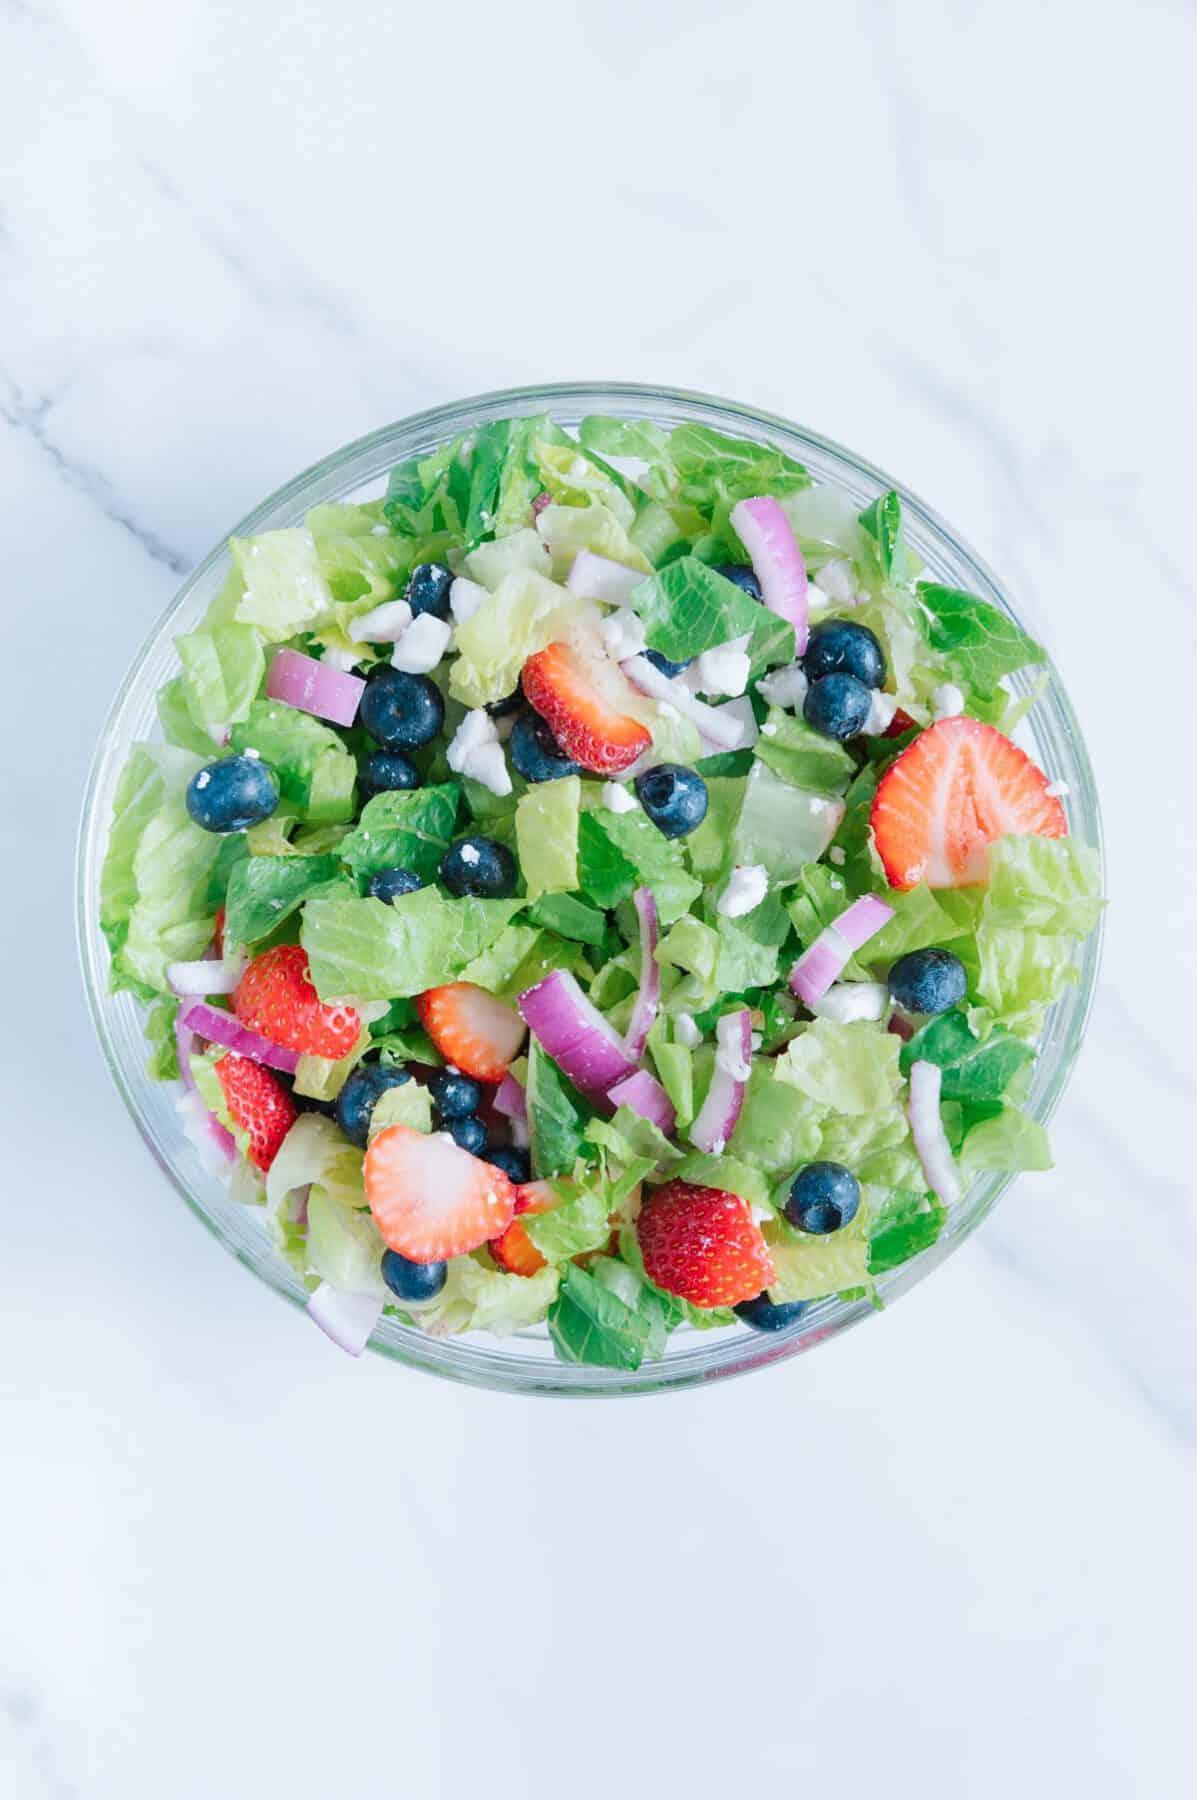 Vegan Blueberry Salad